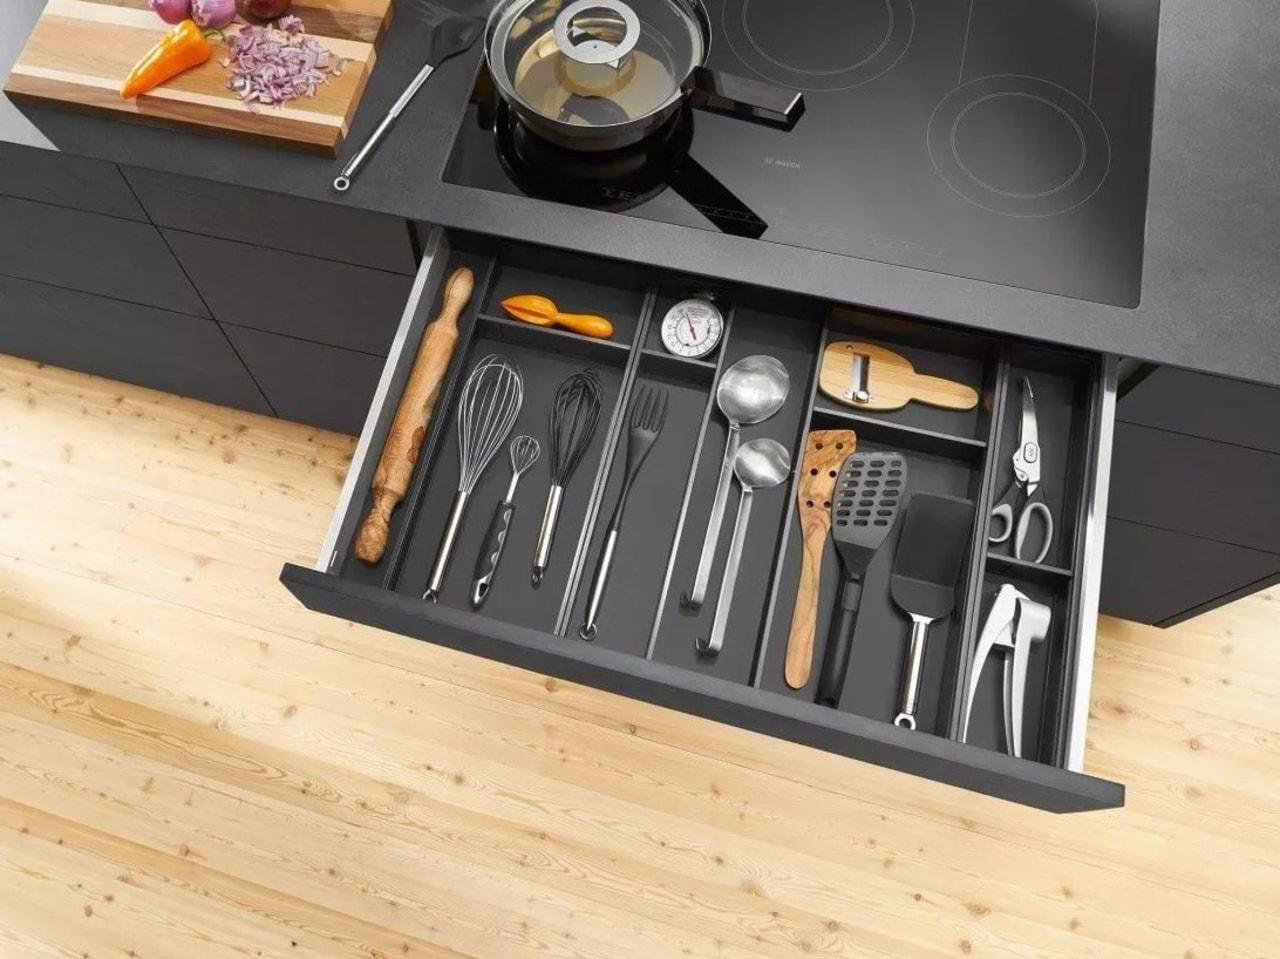 AMBIA-LINE from Blum furniture, product design, tool, orange, black